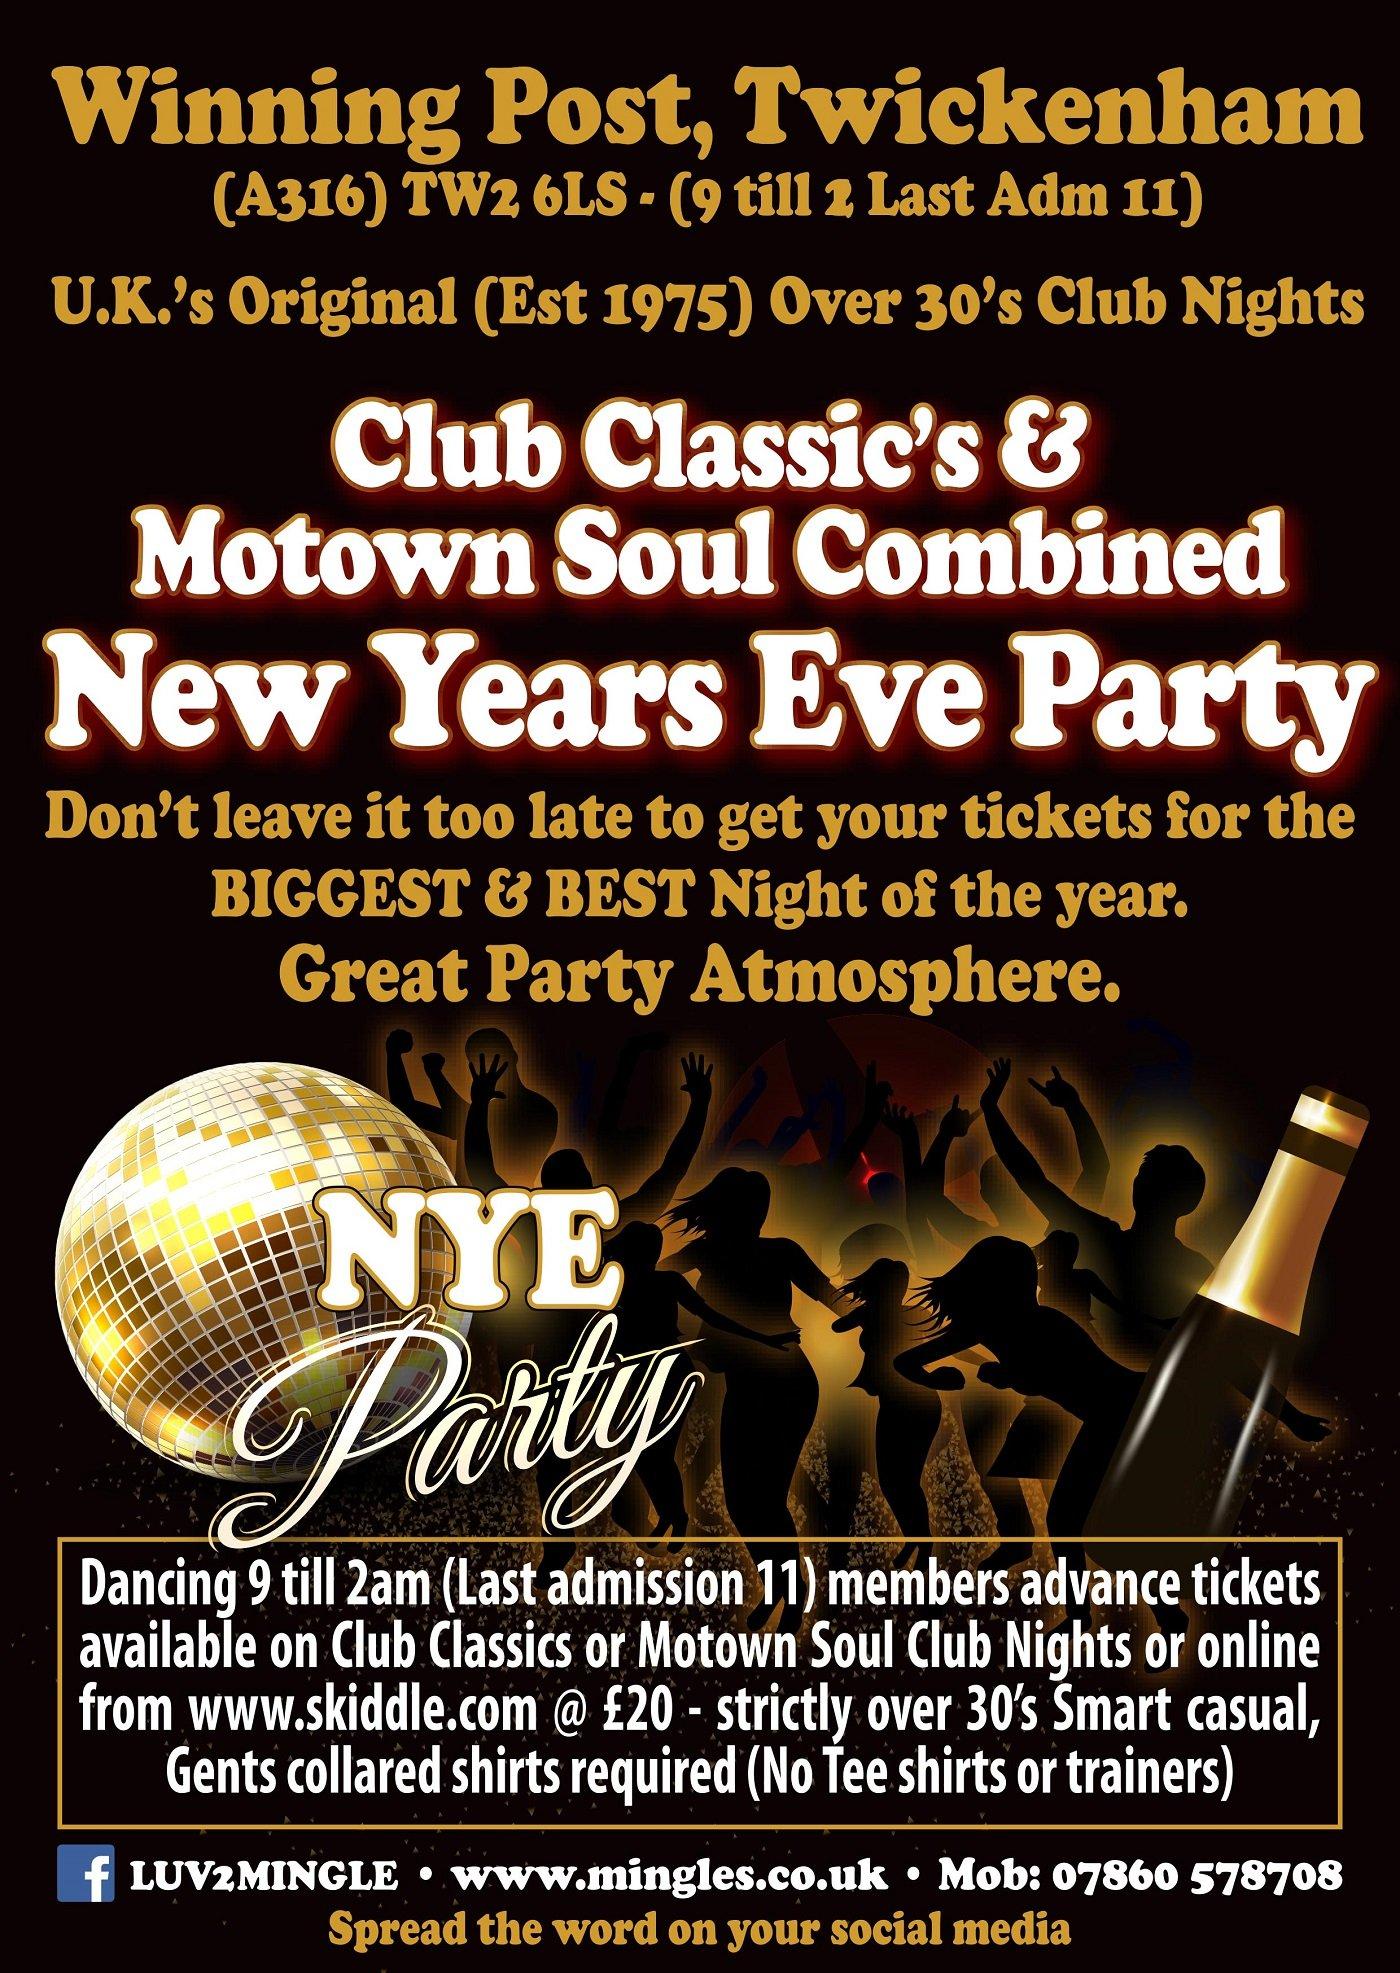 New years eve party 2021 at The Winning Post Twickenham